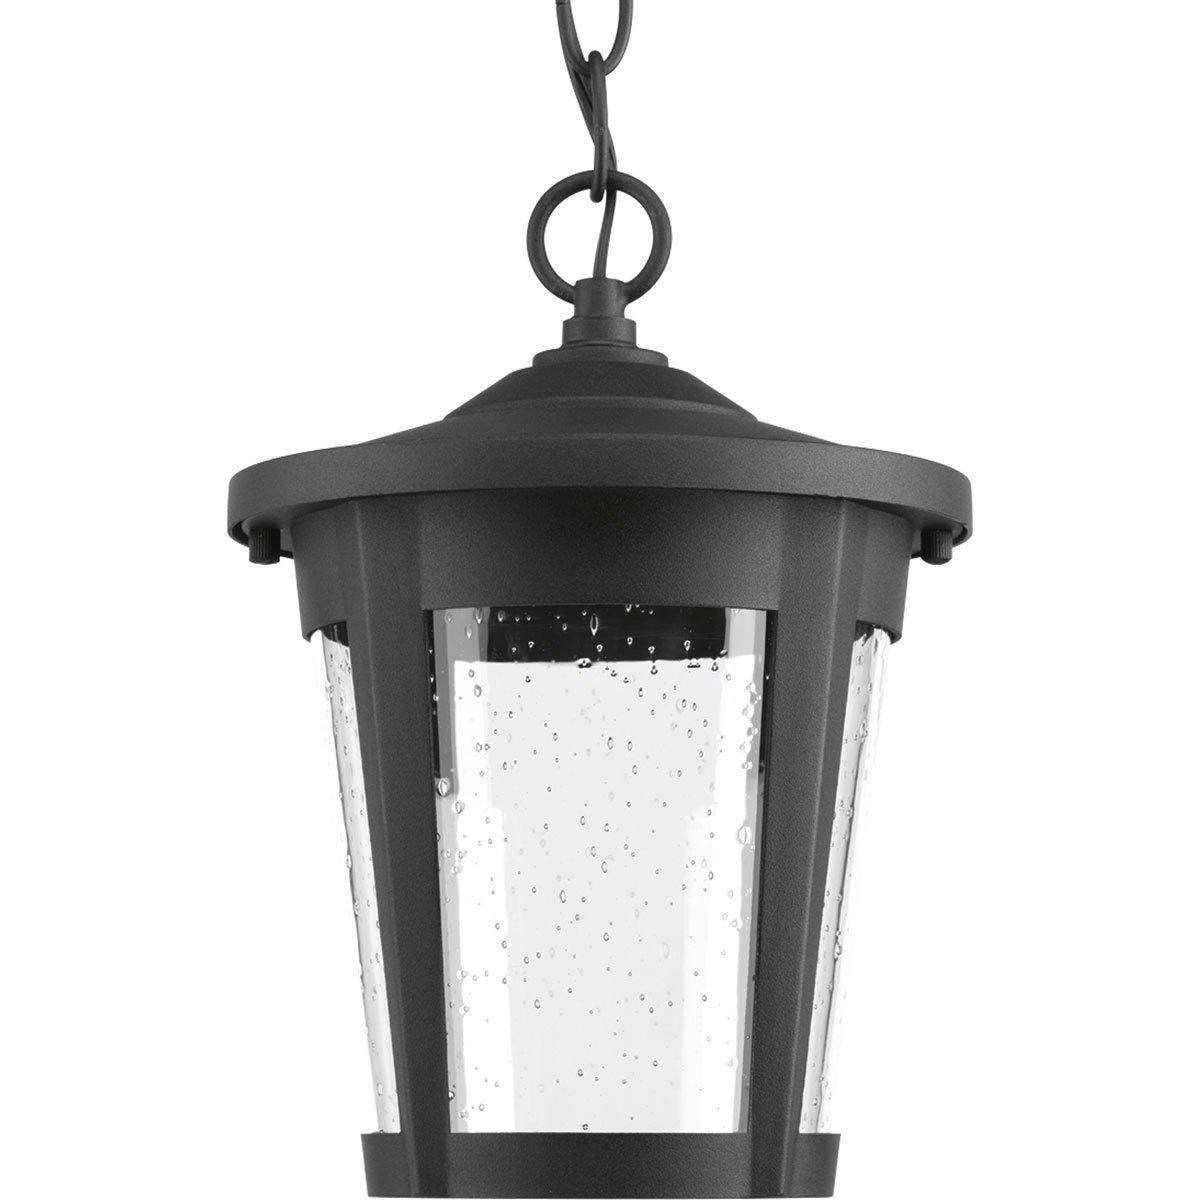 Progress Lighting P6530-3130K9 Contemporary/Soft 1-9W Led Hanging Lantern, Black